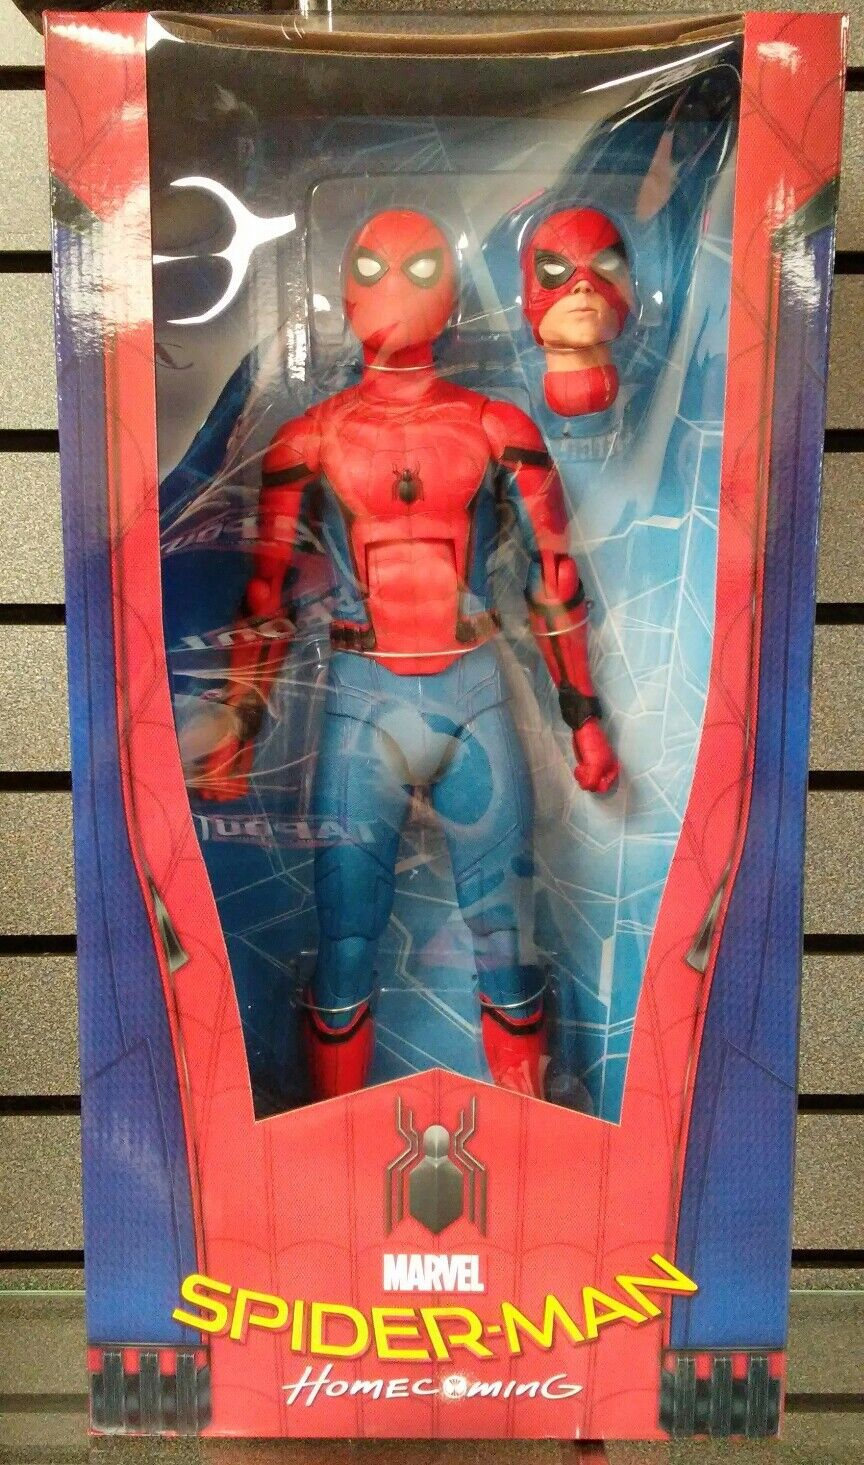 Neca   Spiderman   Marvel   Home coming 1 4 Scale Figure   neuf   Livraison rapide